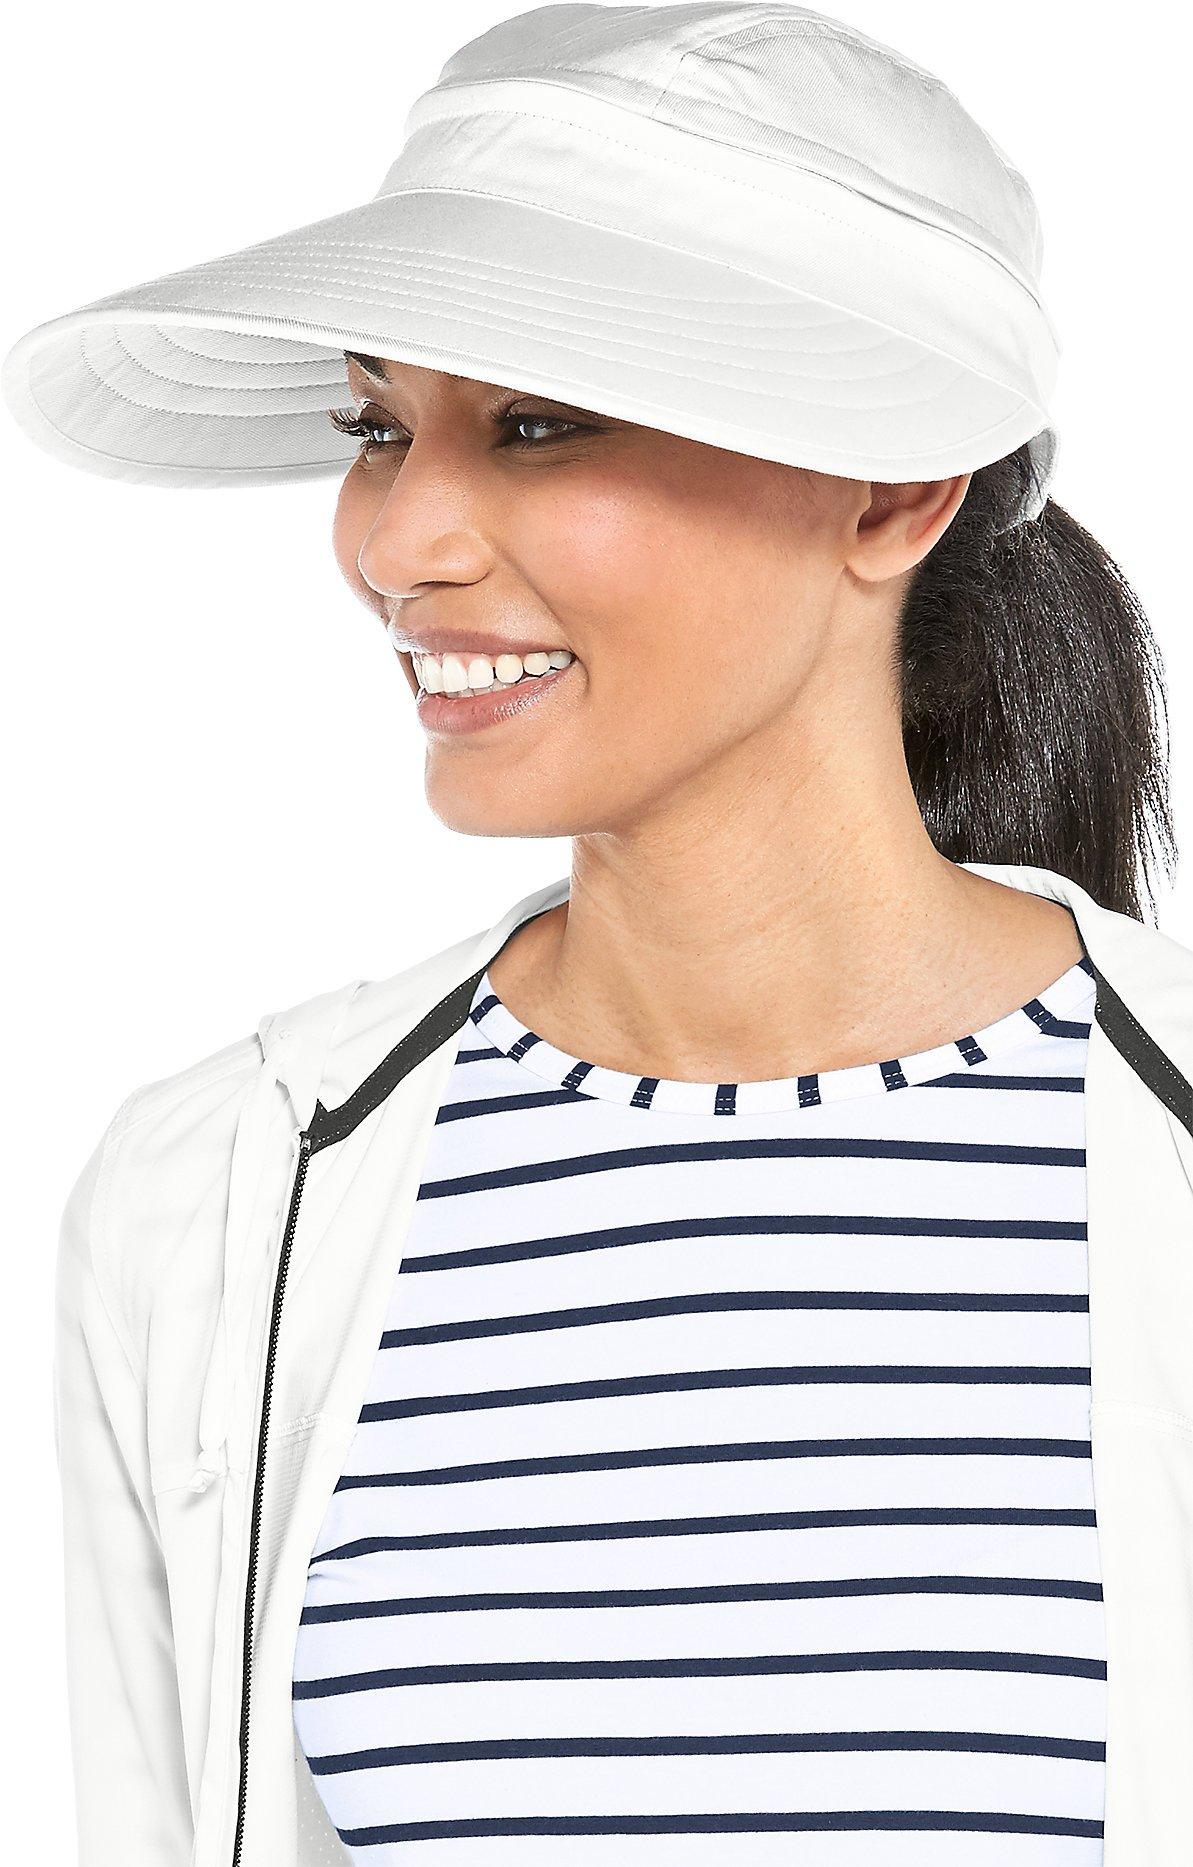 Coolibar UPF 50+ Women's Bel Aire Zip-Off Sun Visor - Sun Protective (One Size- White)